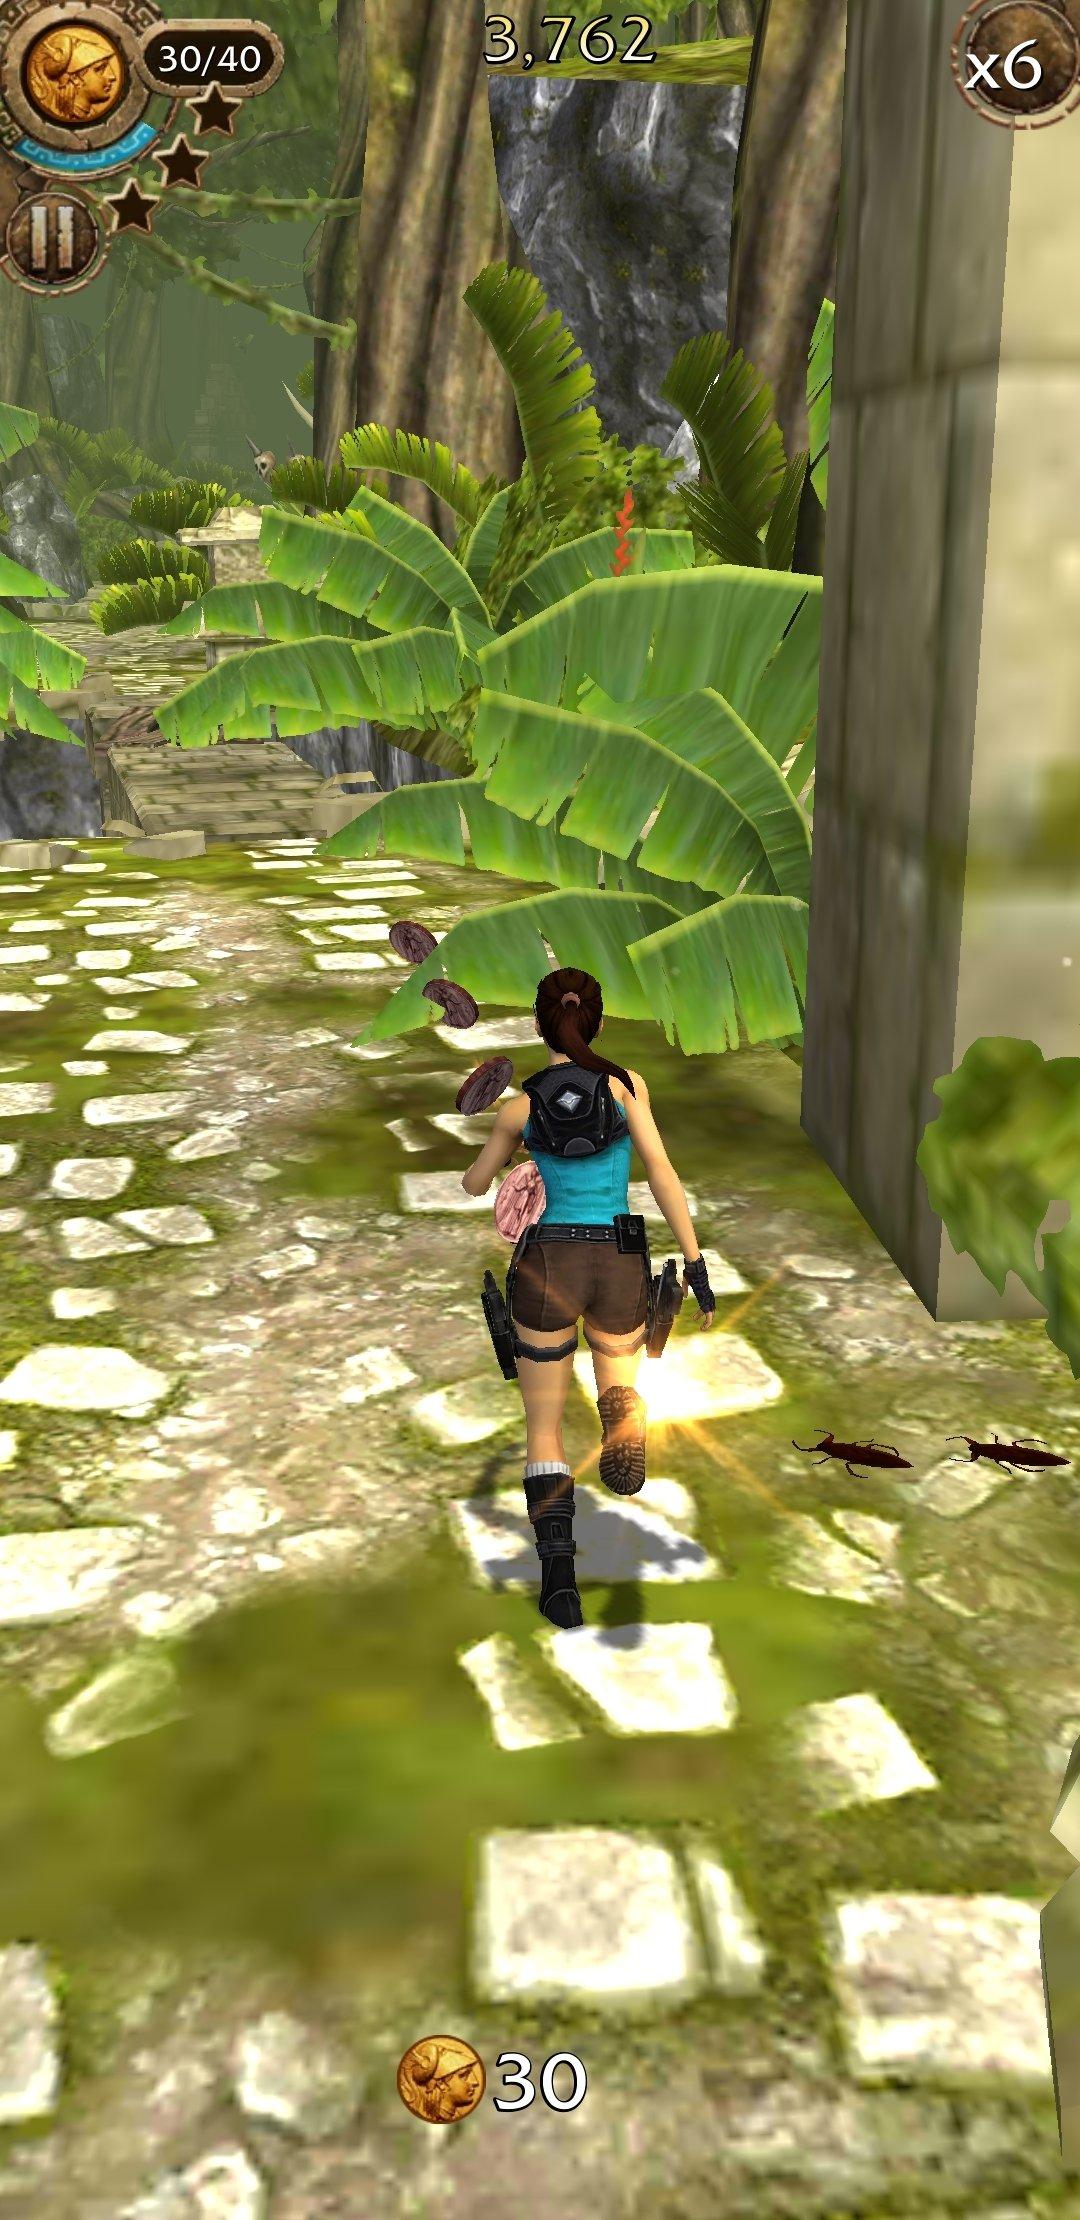 Lara Croft: Relic Run Android image 5